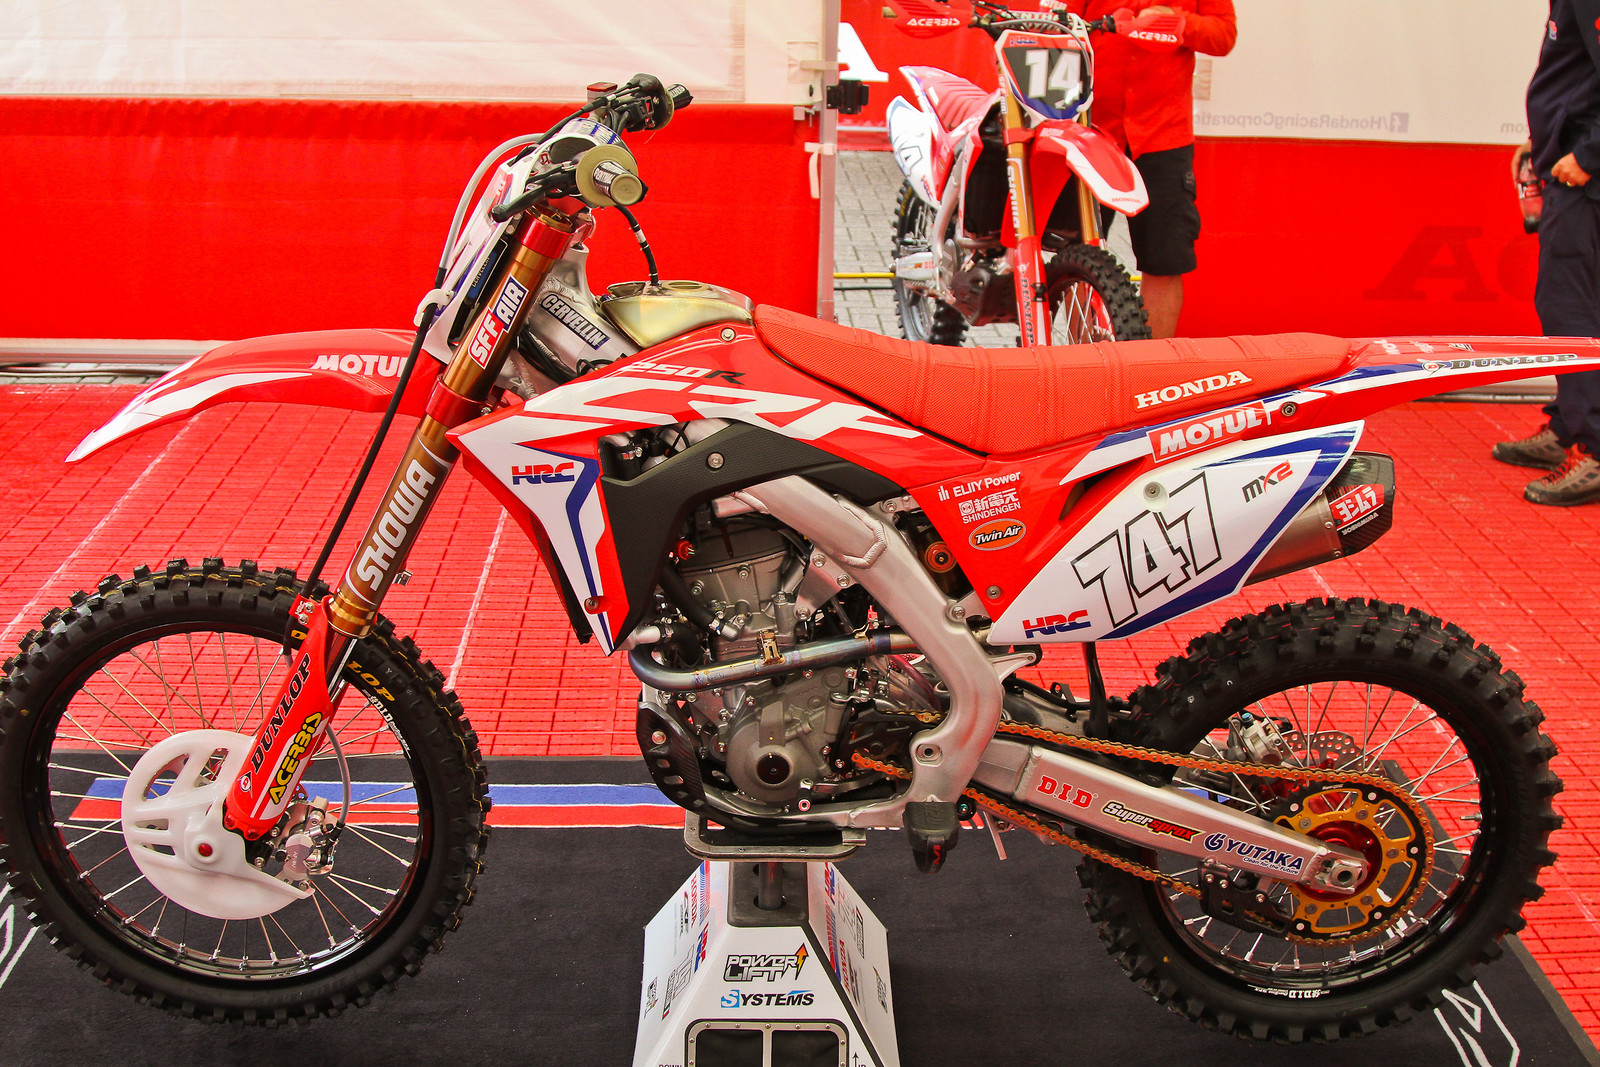 2018 Honda CRF250RW - Left Side - Michele Cervellin - ayearinmx - Motocross Pictures - Vital MX